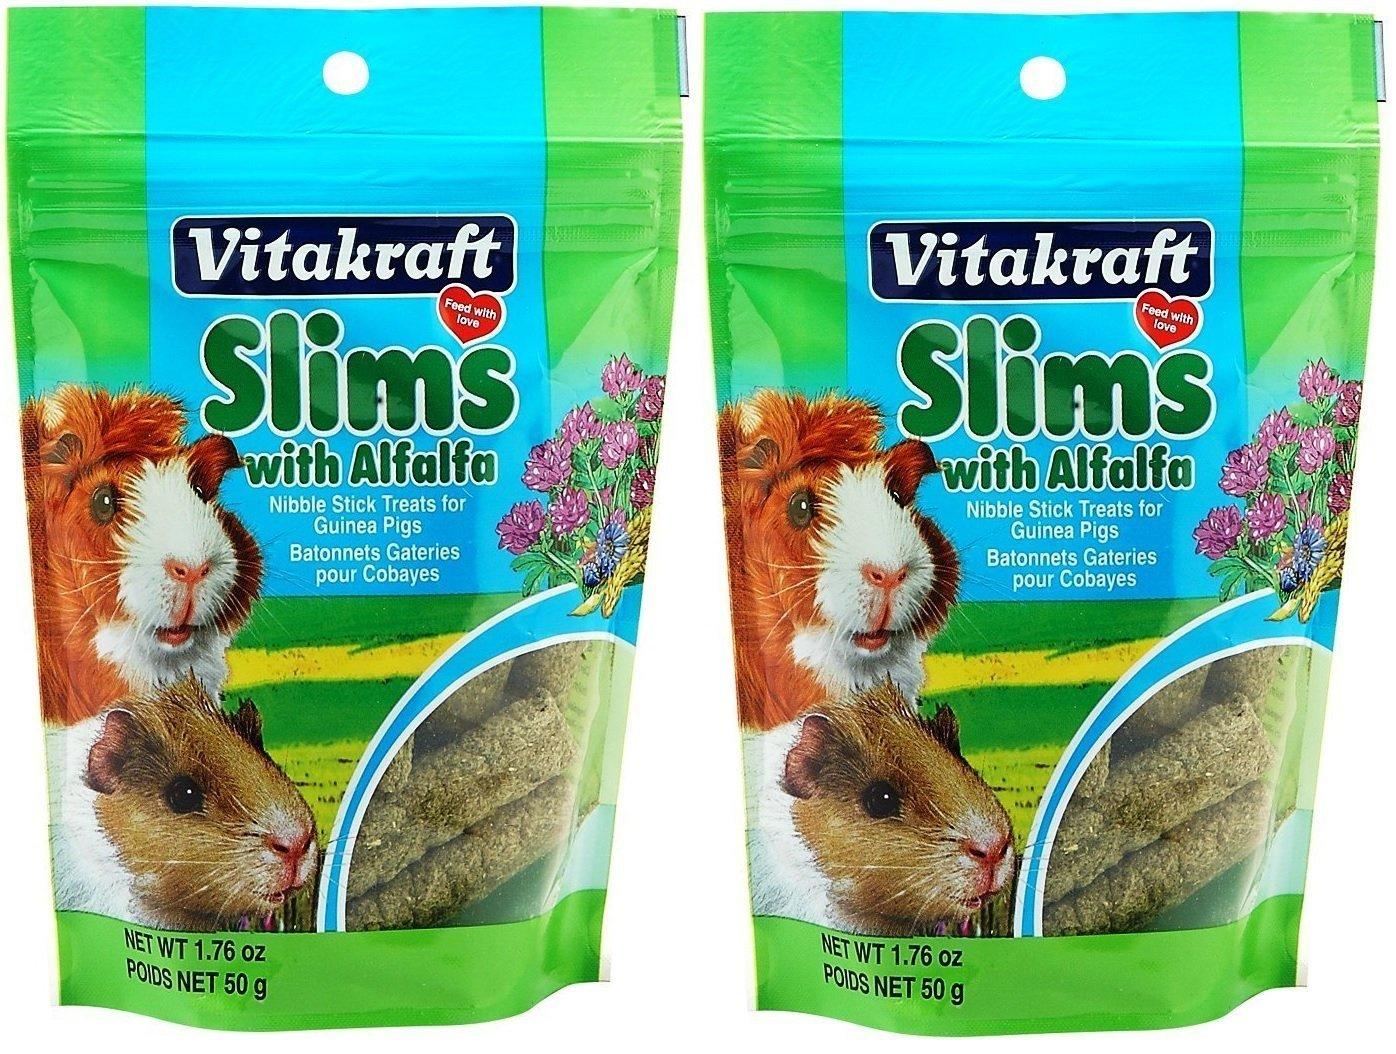 Vitakraft Guinea Pig Slims with Alfalfa Nibble Stick Treat, 2 Count